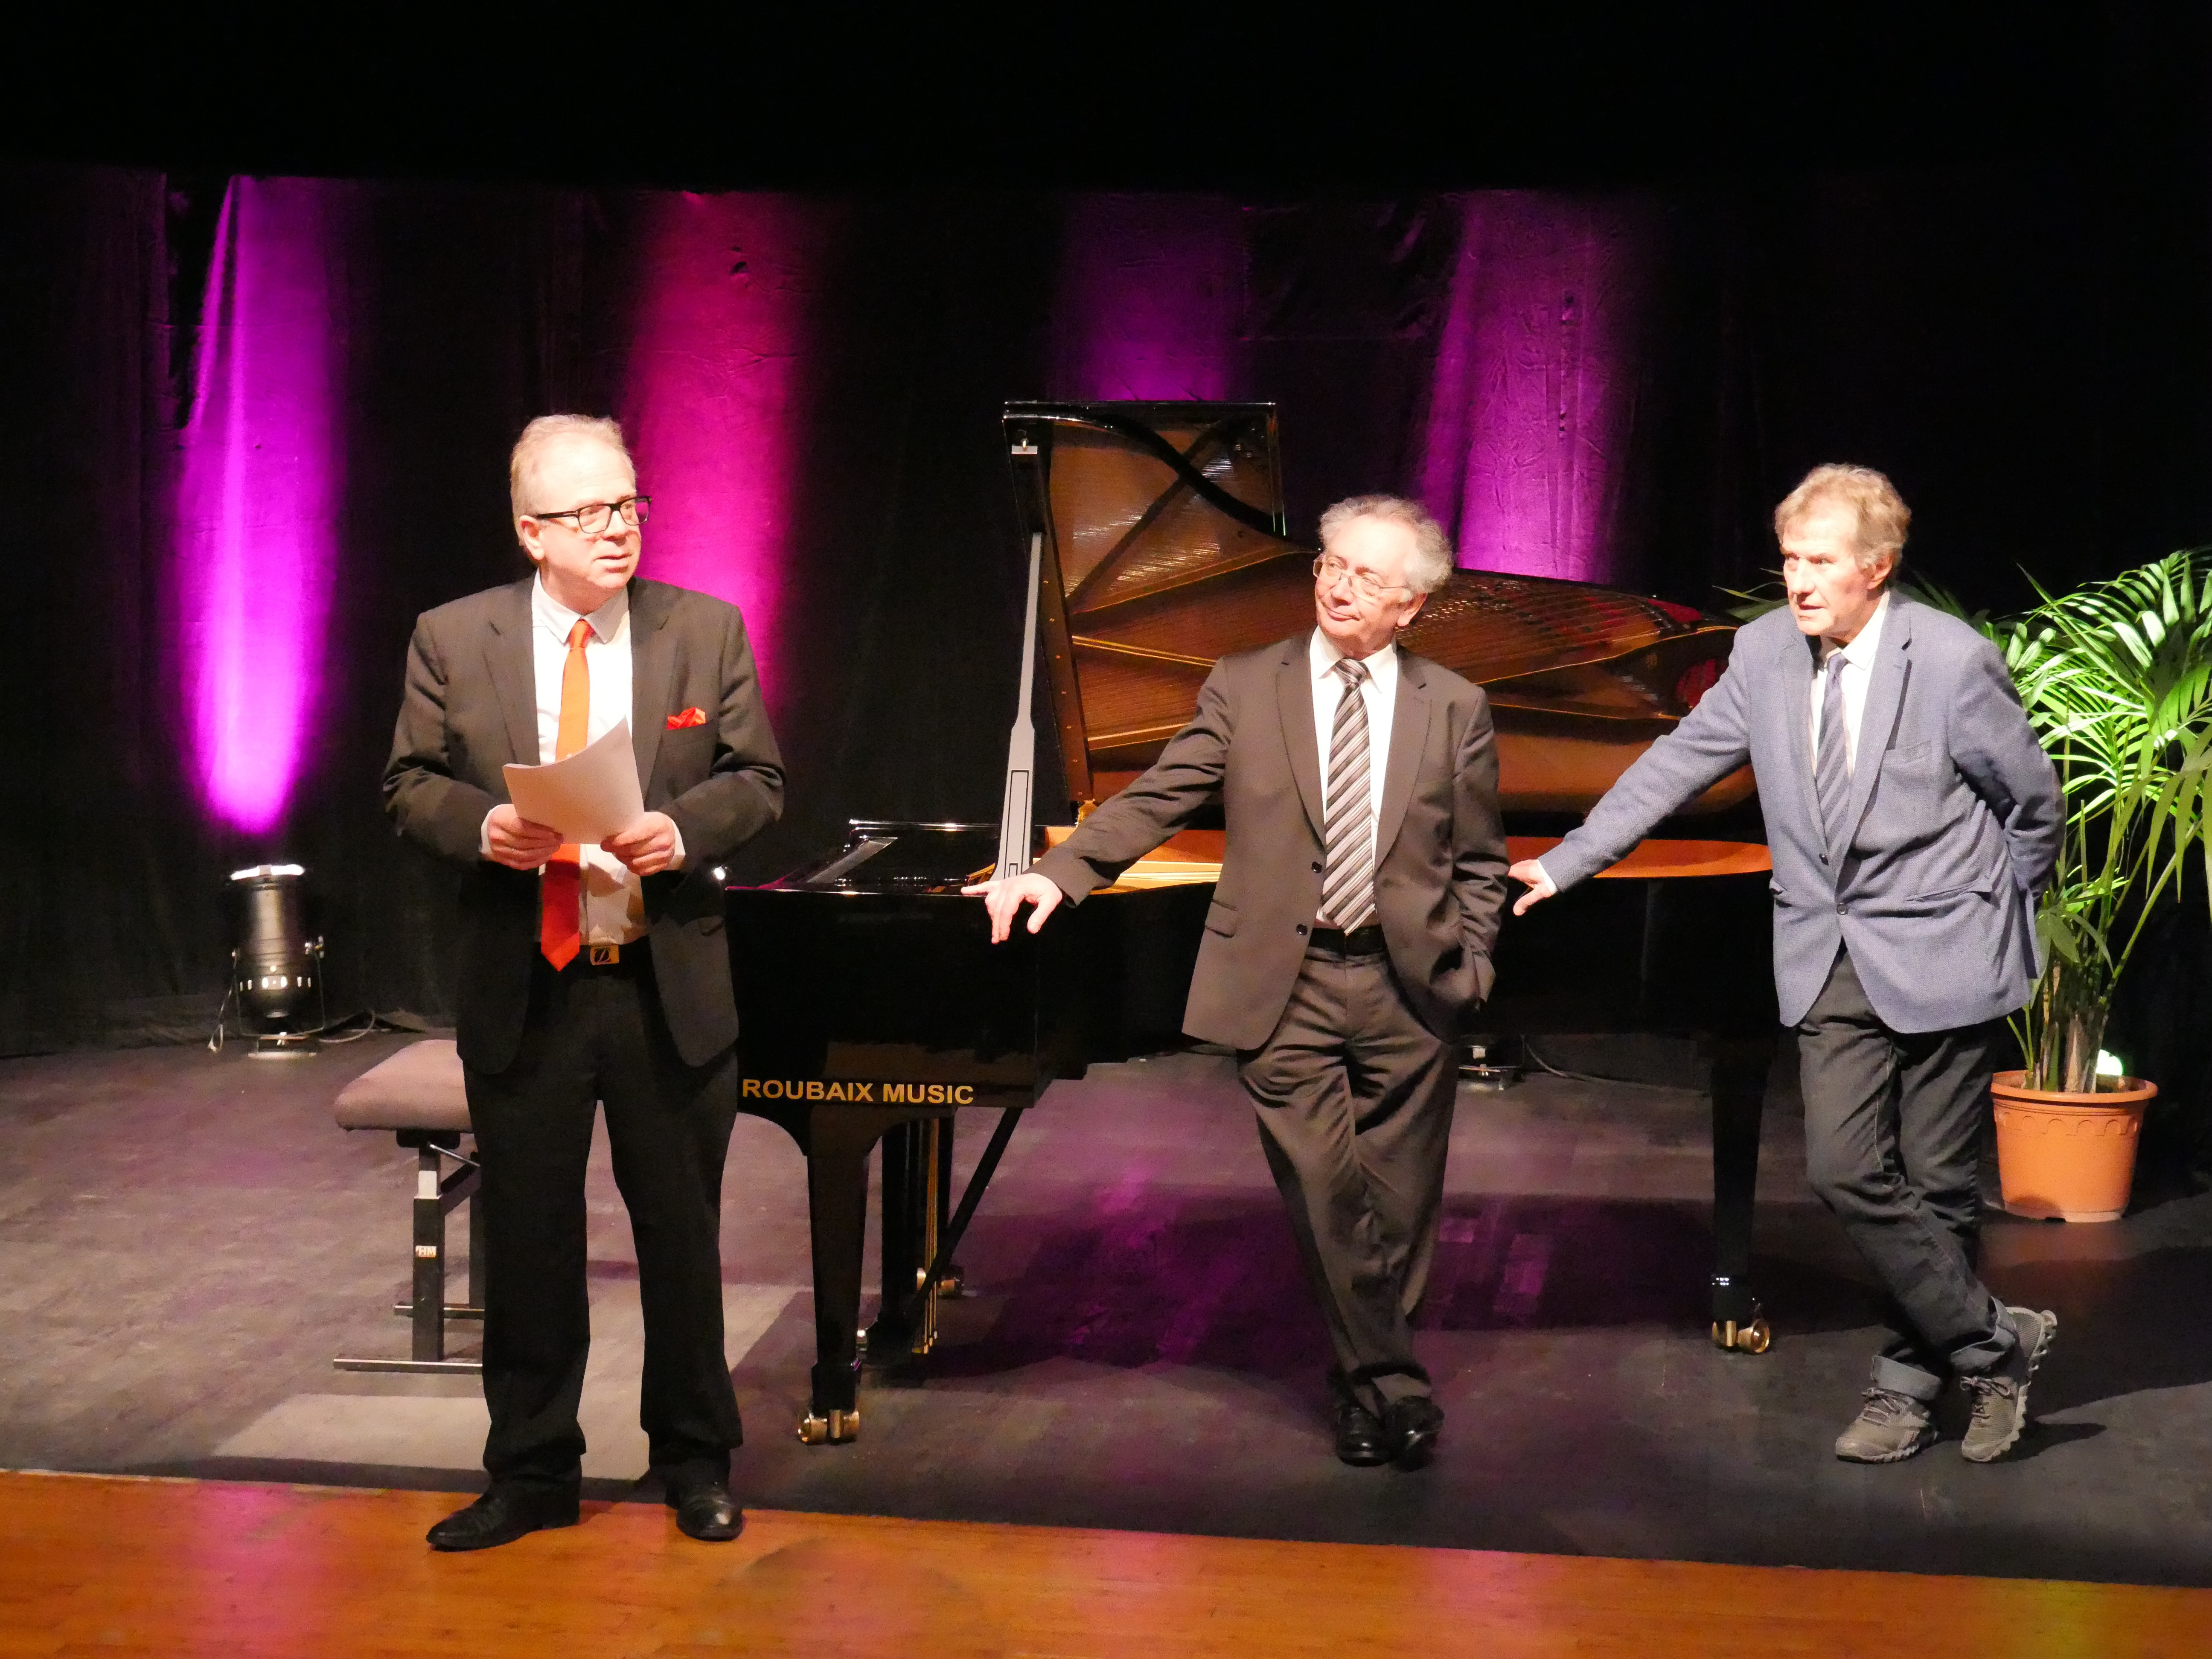 Denis Simandy, Jury au Concours Pianissima International